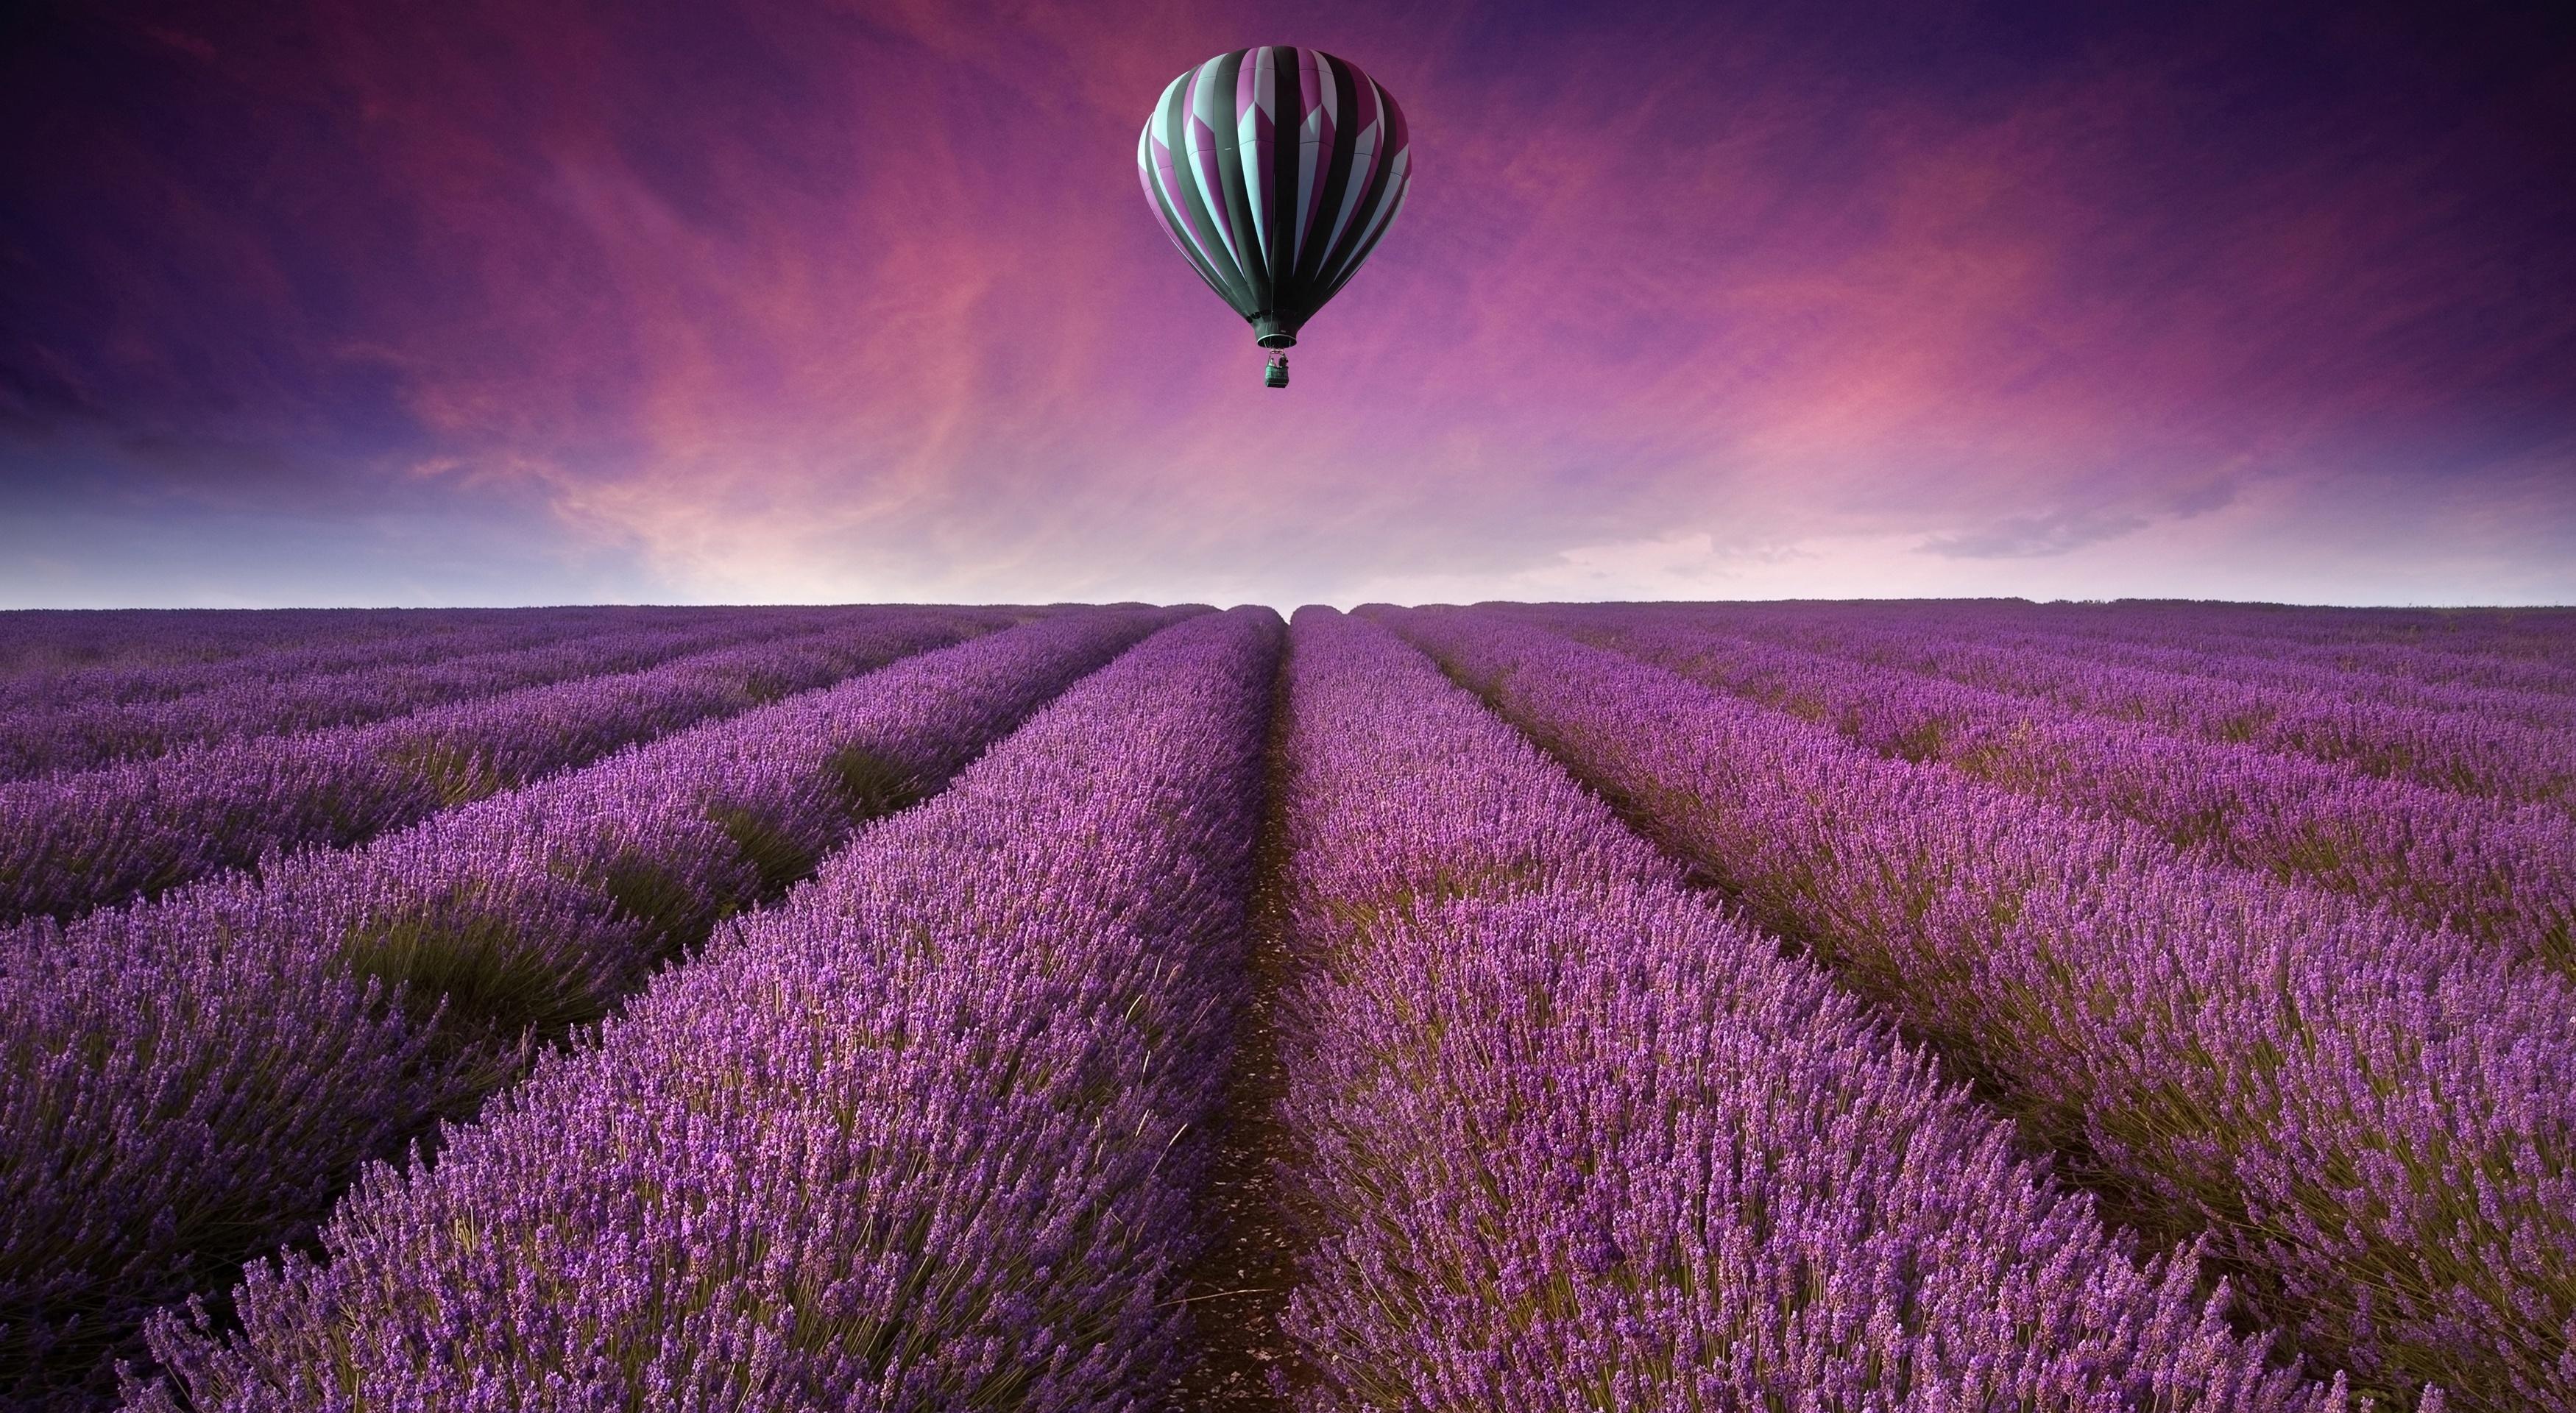 3d Christmas Wallpaper Backgrounds 2015 Purple Flower Wallpaper Hd Pixelstalk Net